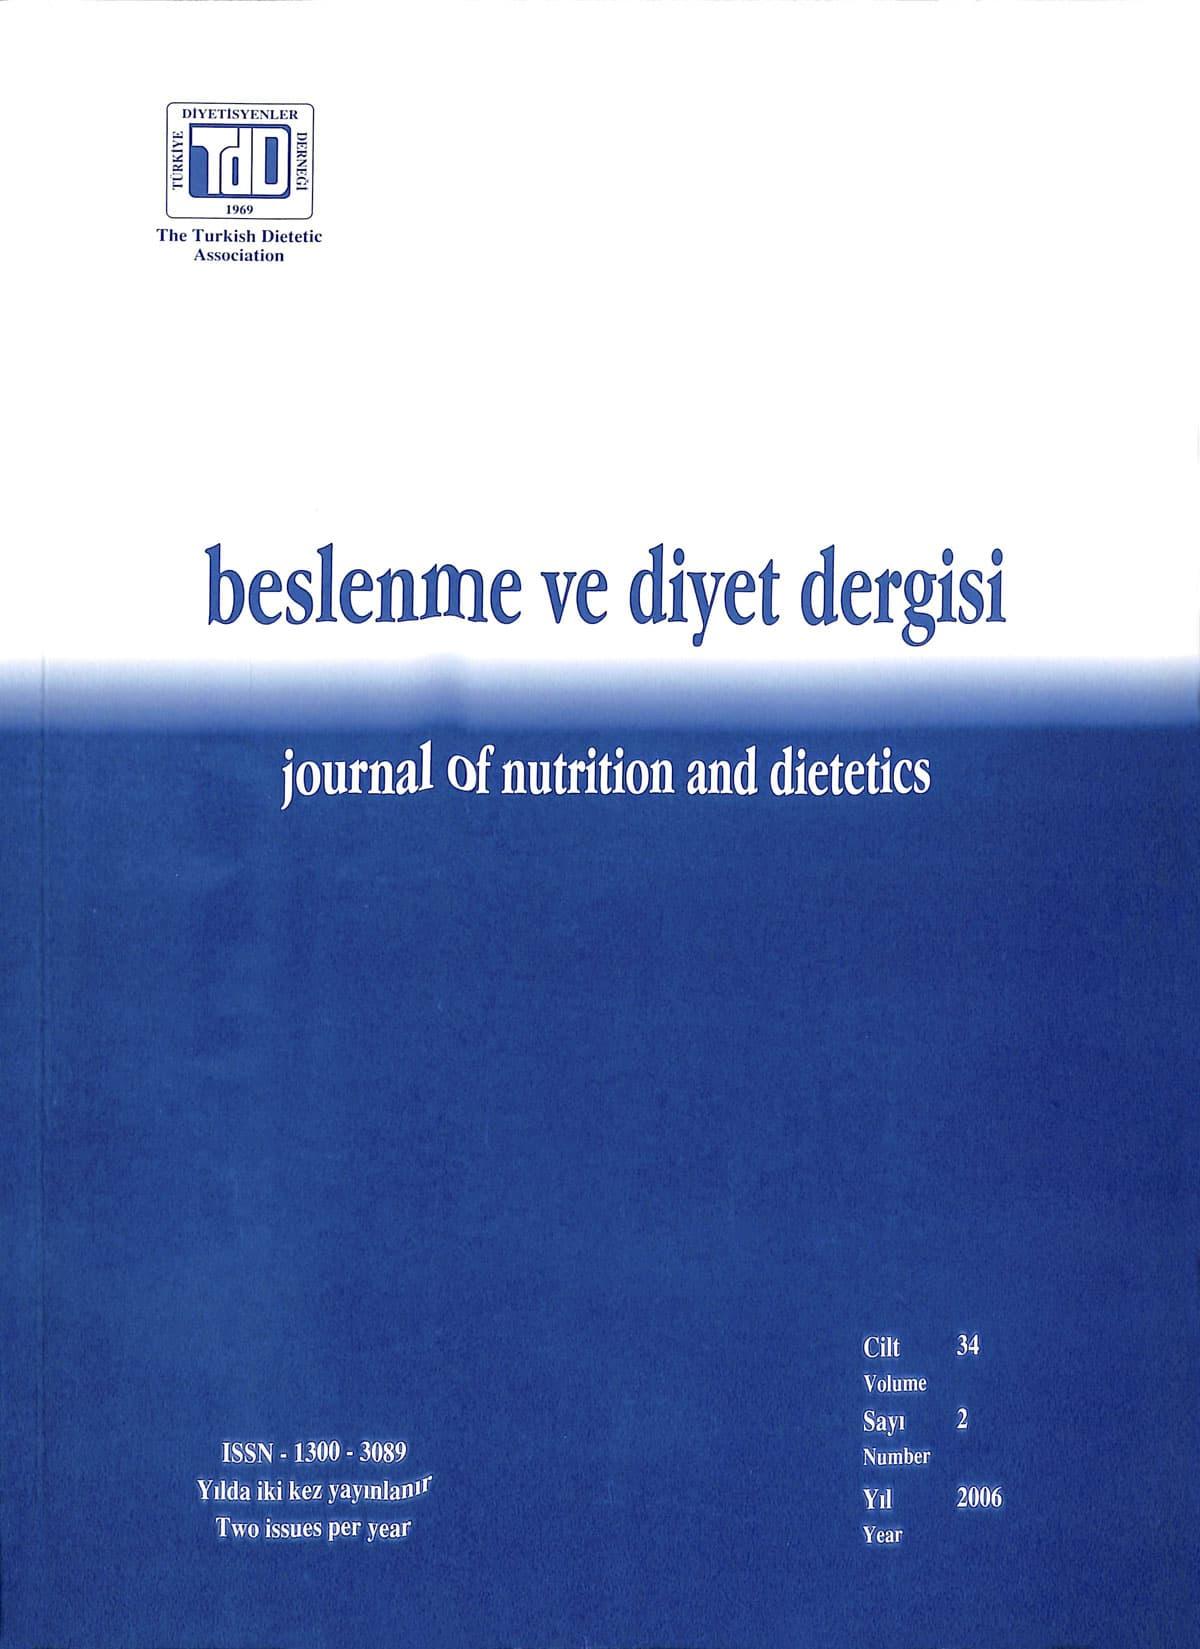 Cilt 34 Sayı 2 (2006)